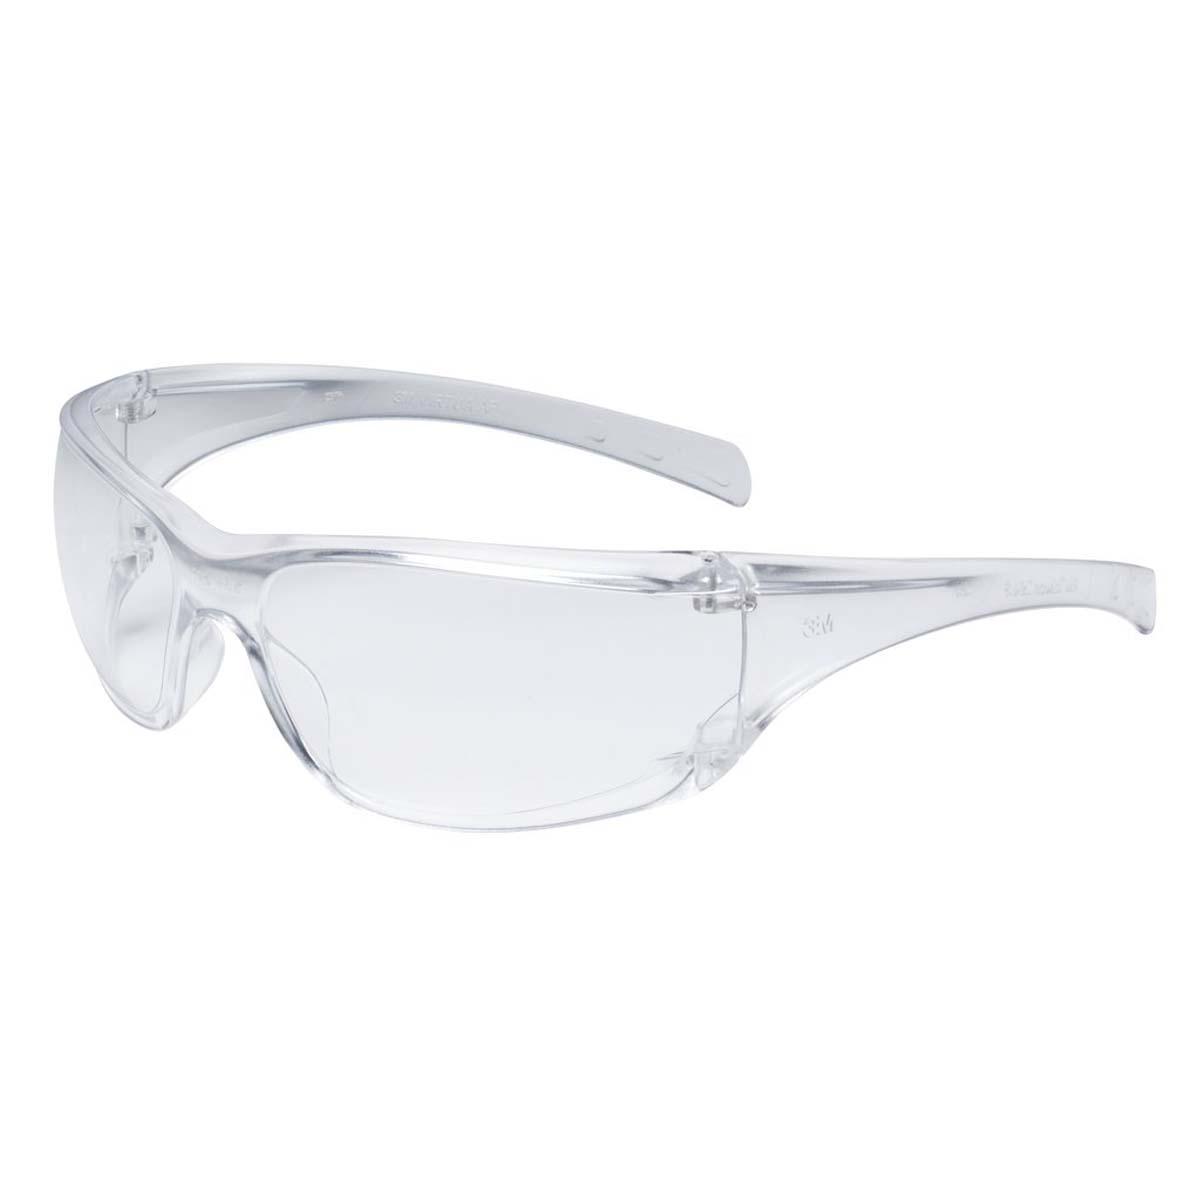 "3Mâ""¢ Virtuaâ""¢ AP Protective Eyewear 11819-00000-20, Clear Hard Coat Lens,"